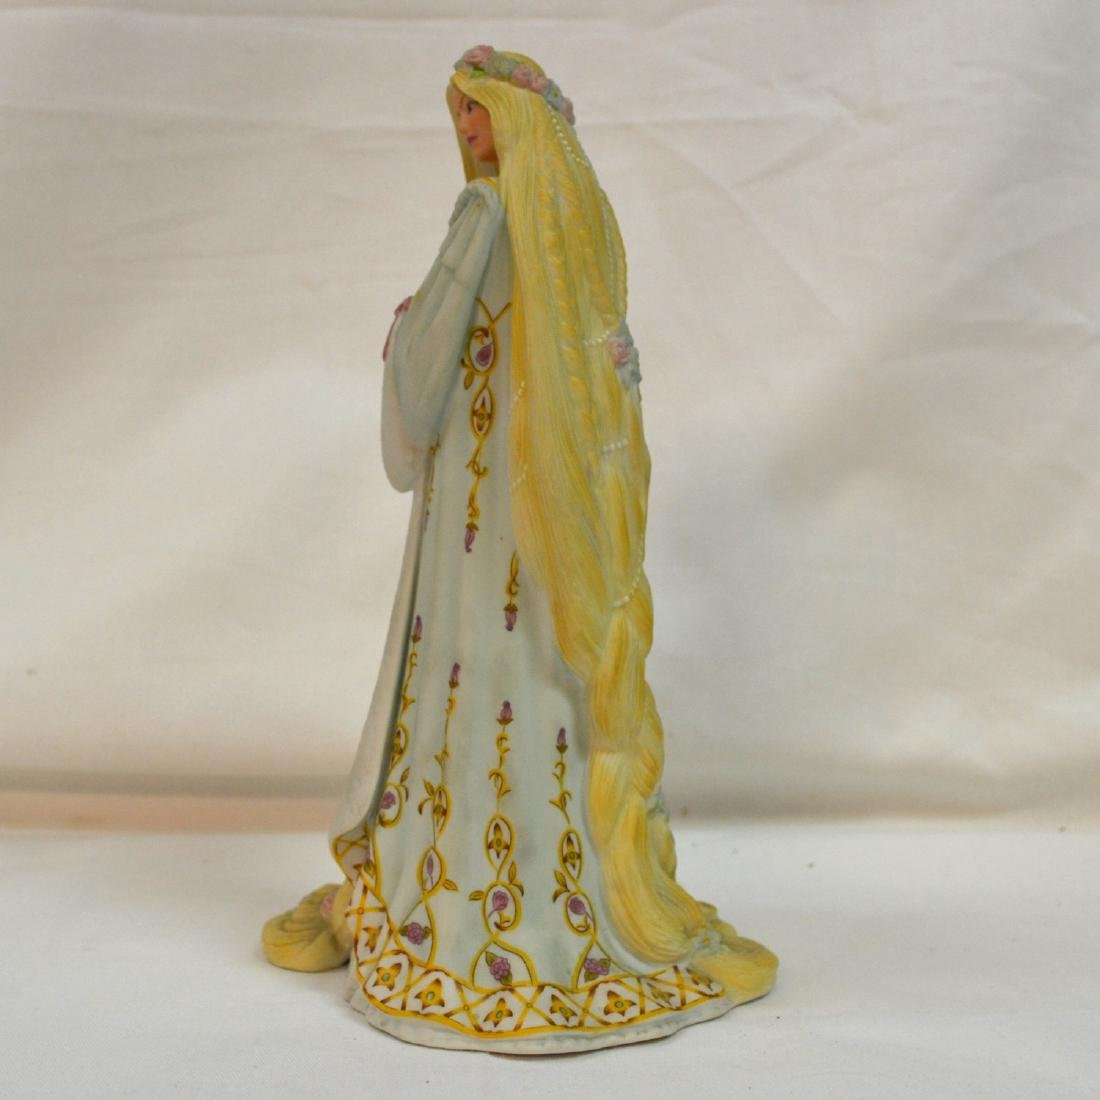 Lenox Legendary Princesses Rapunzel Figurine - 2